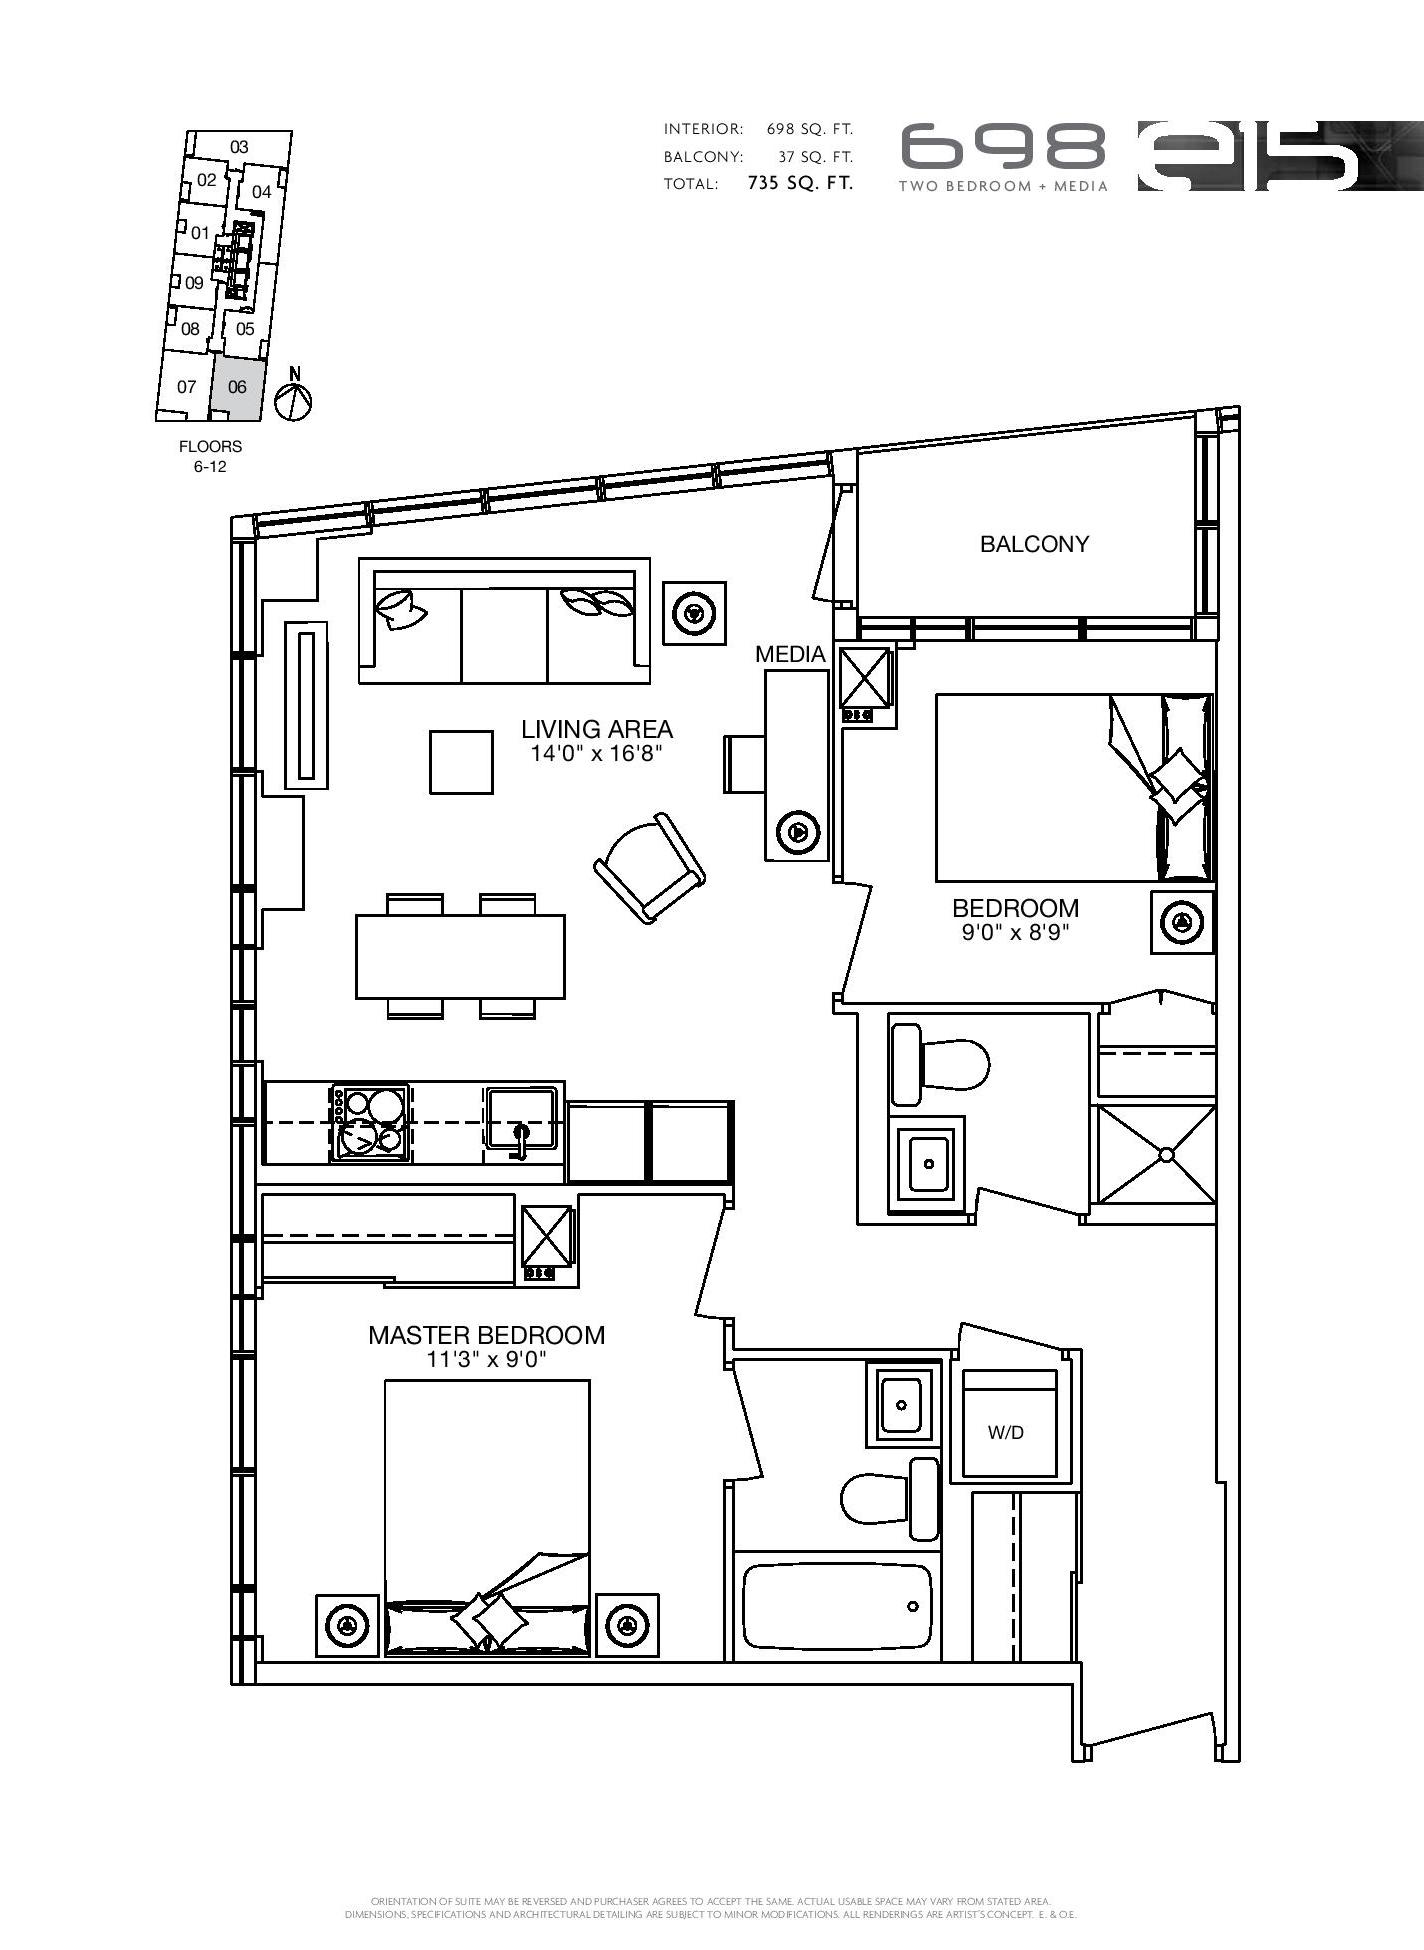 E CONDOS FOR SALE - FLOORPLAN TWO BEDROOM